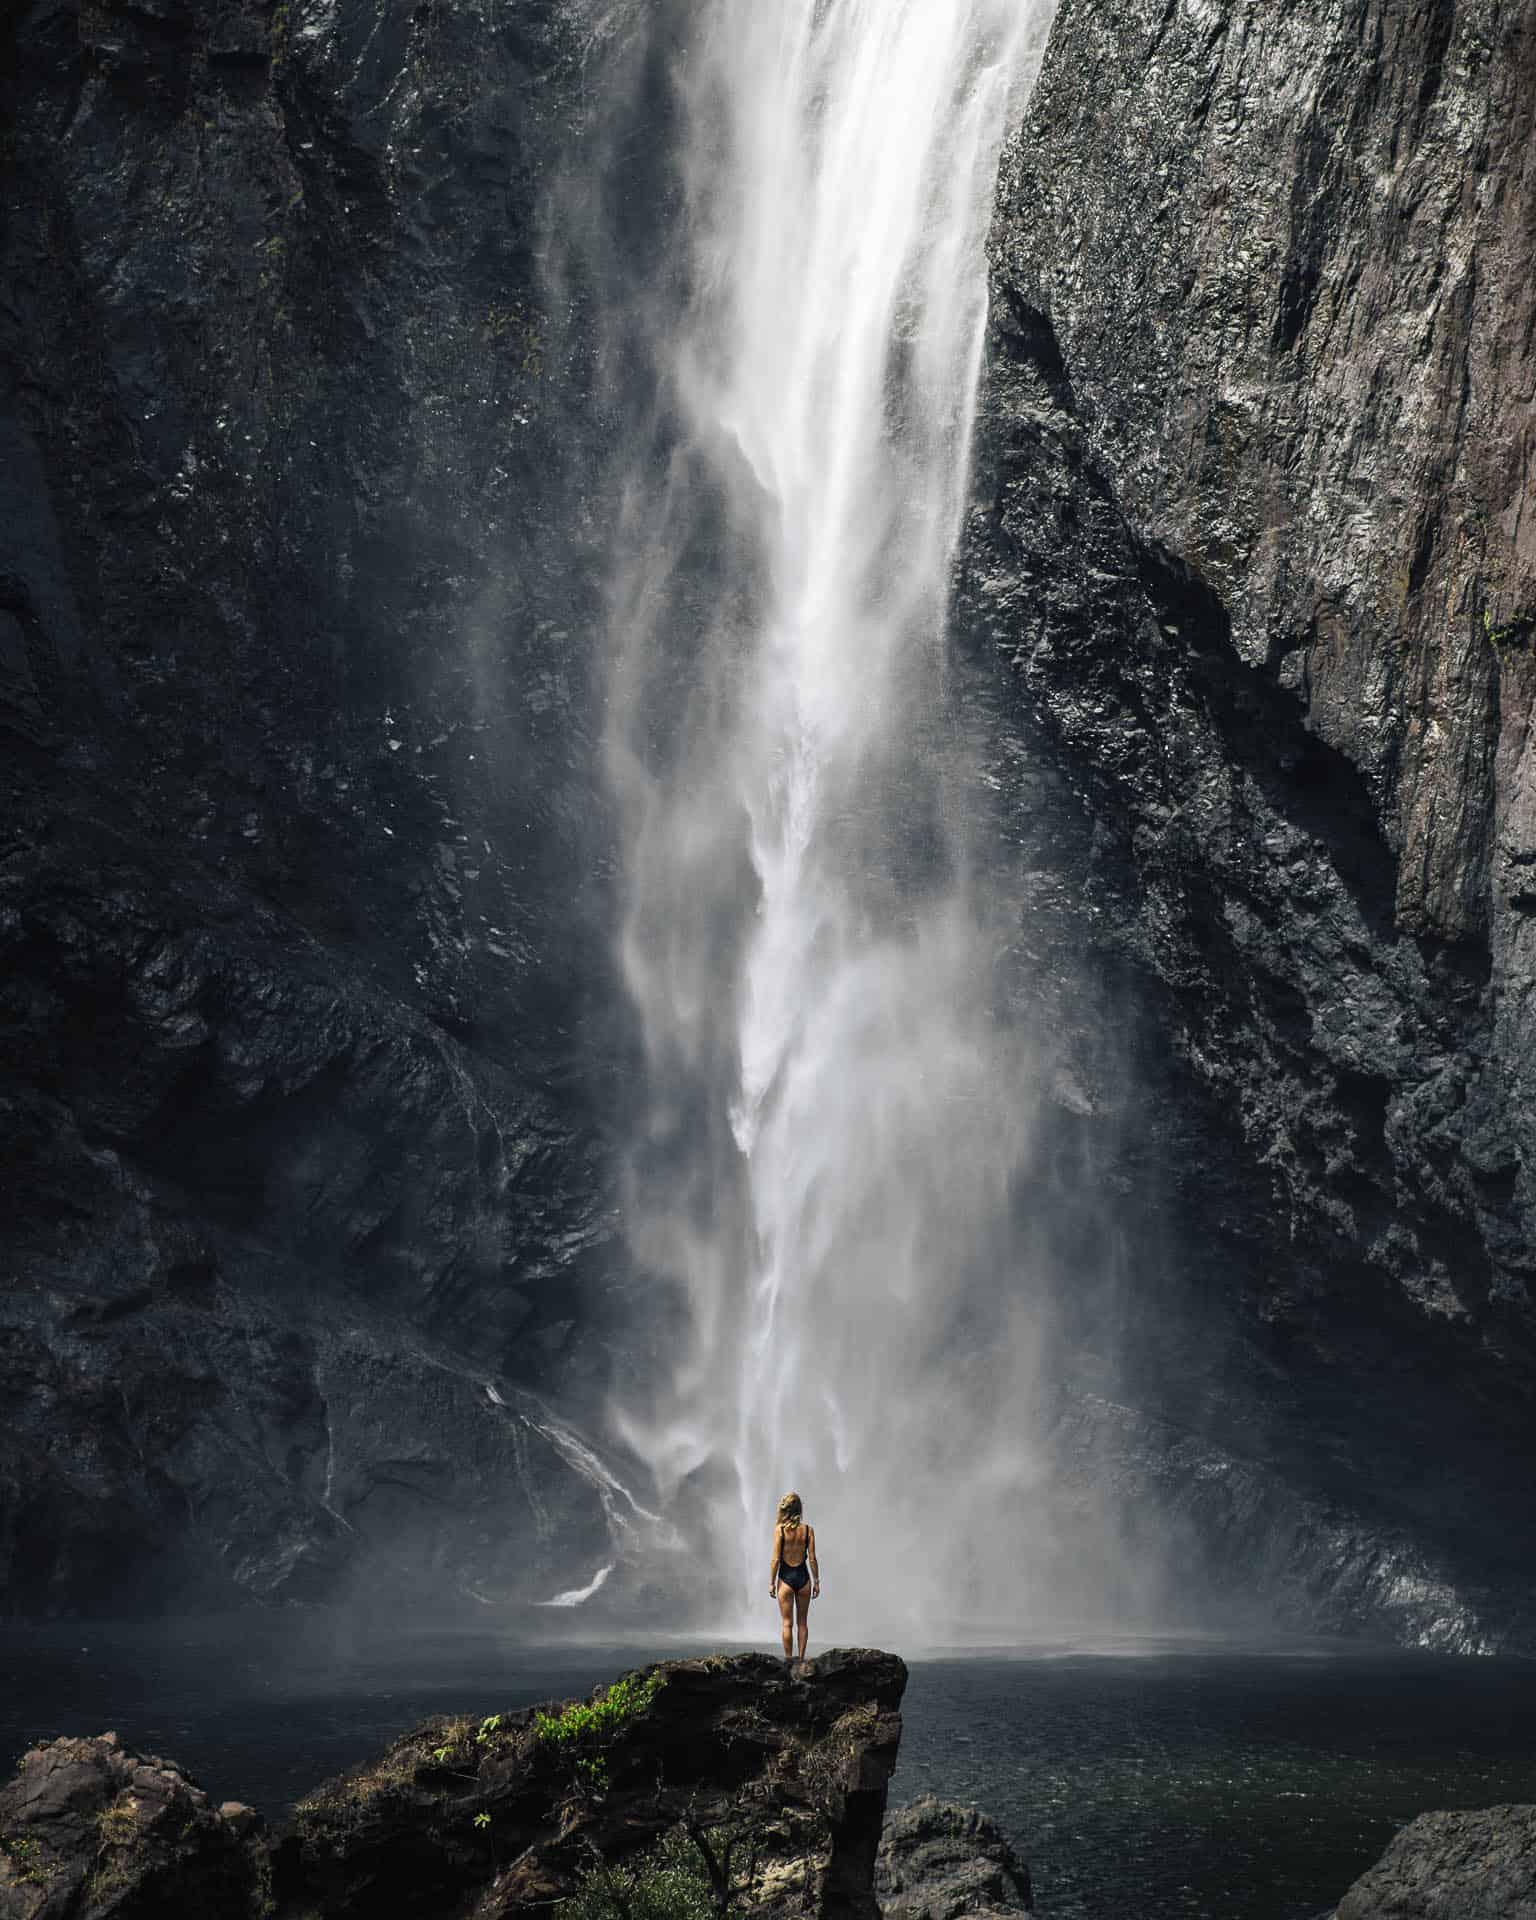 wallaman falls, wallaman falls australia, wallaman falls queensland